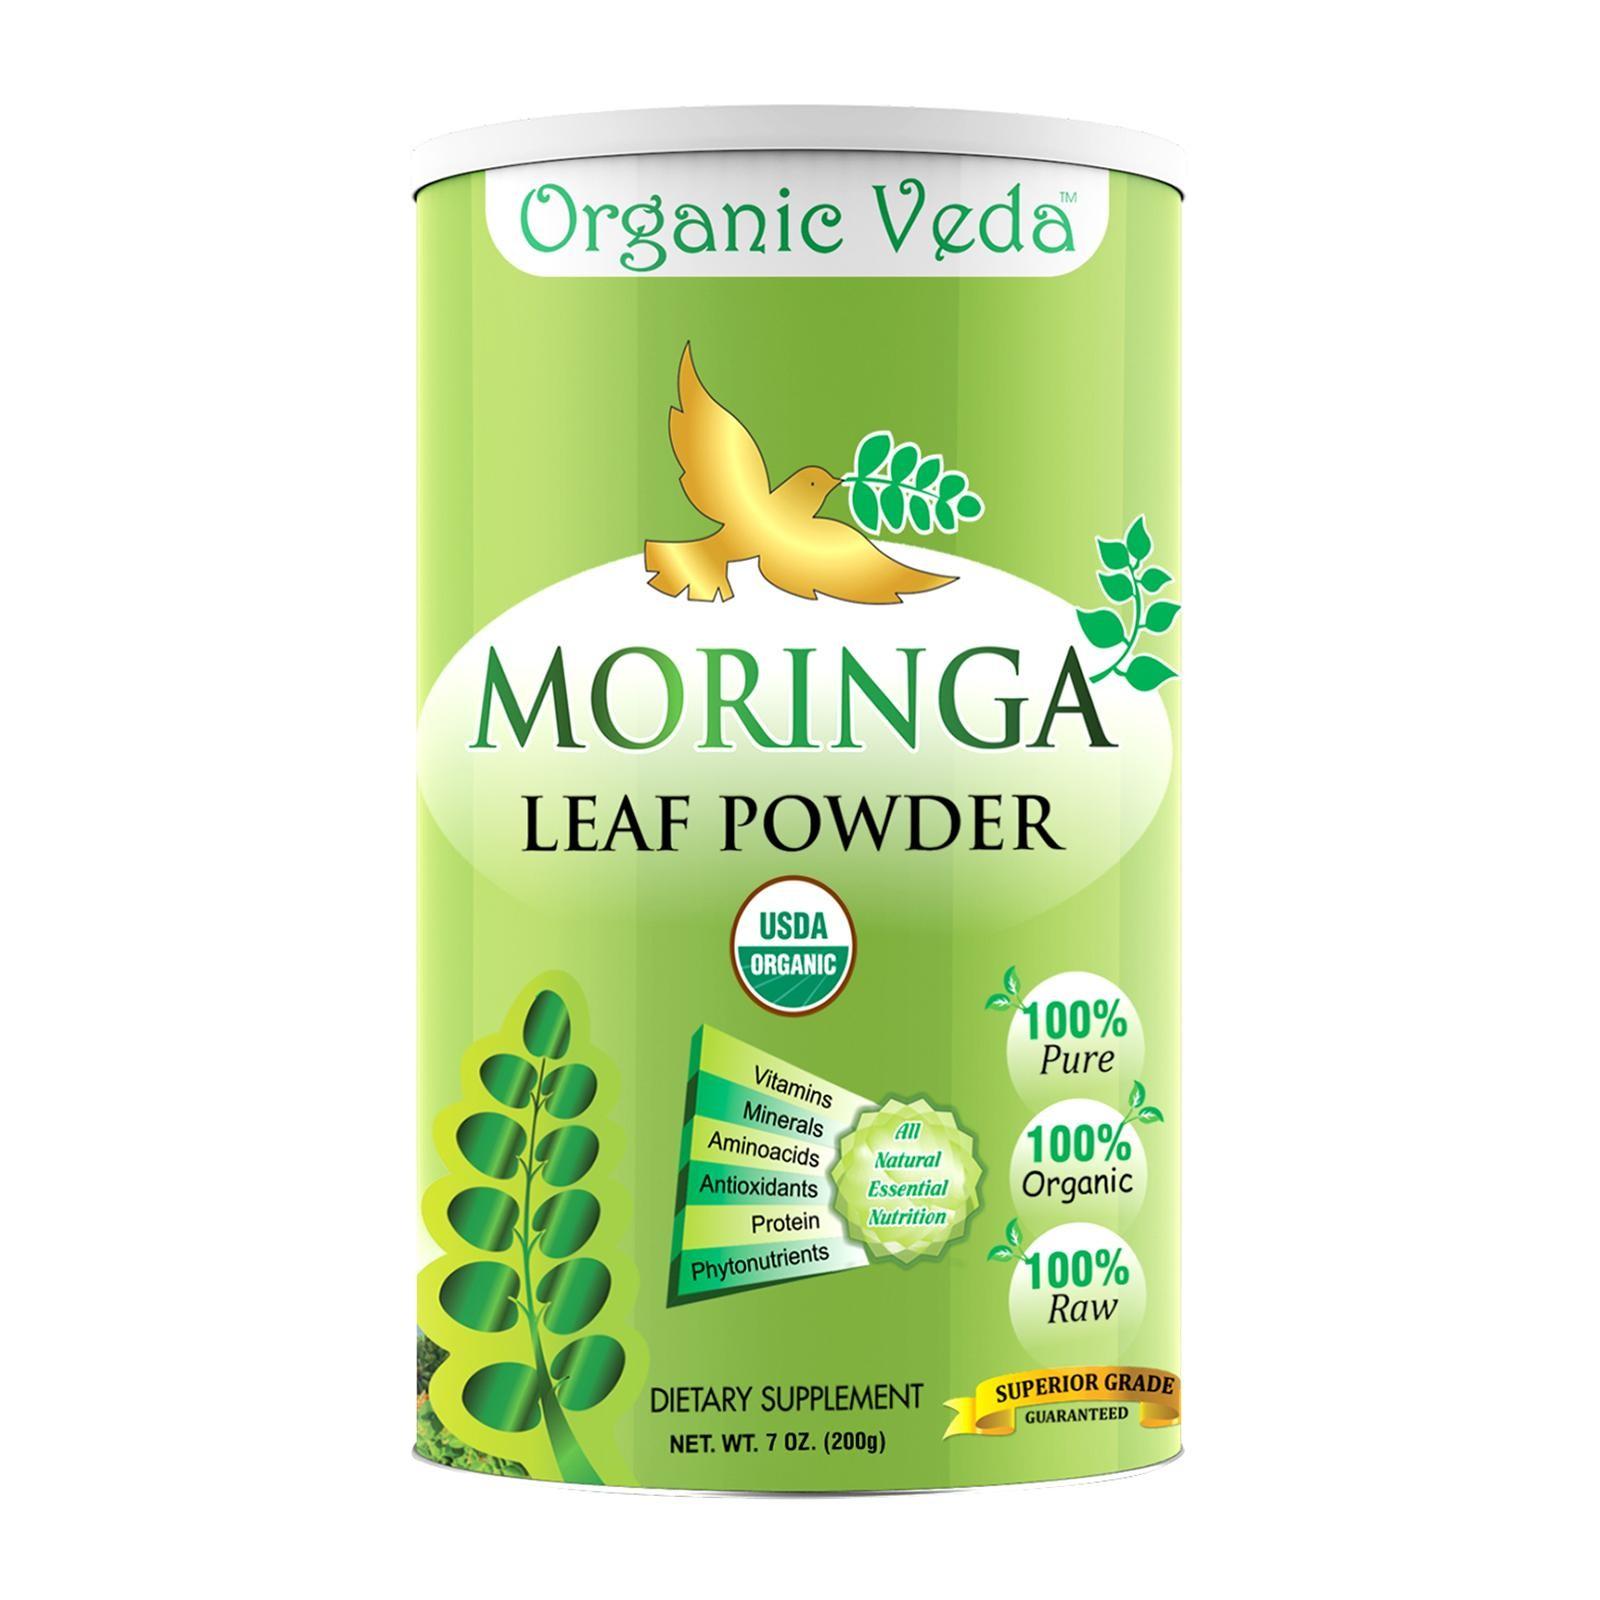 Organic Veda Organic Moringa Leaf Powder 200 Grams